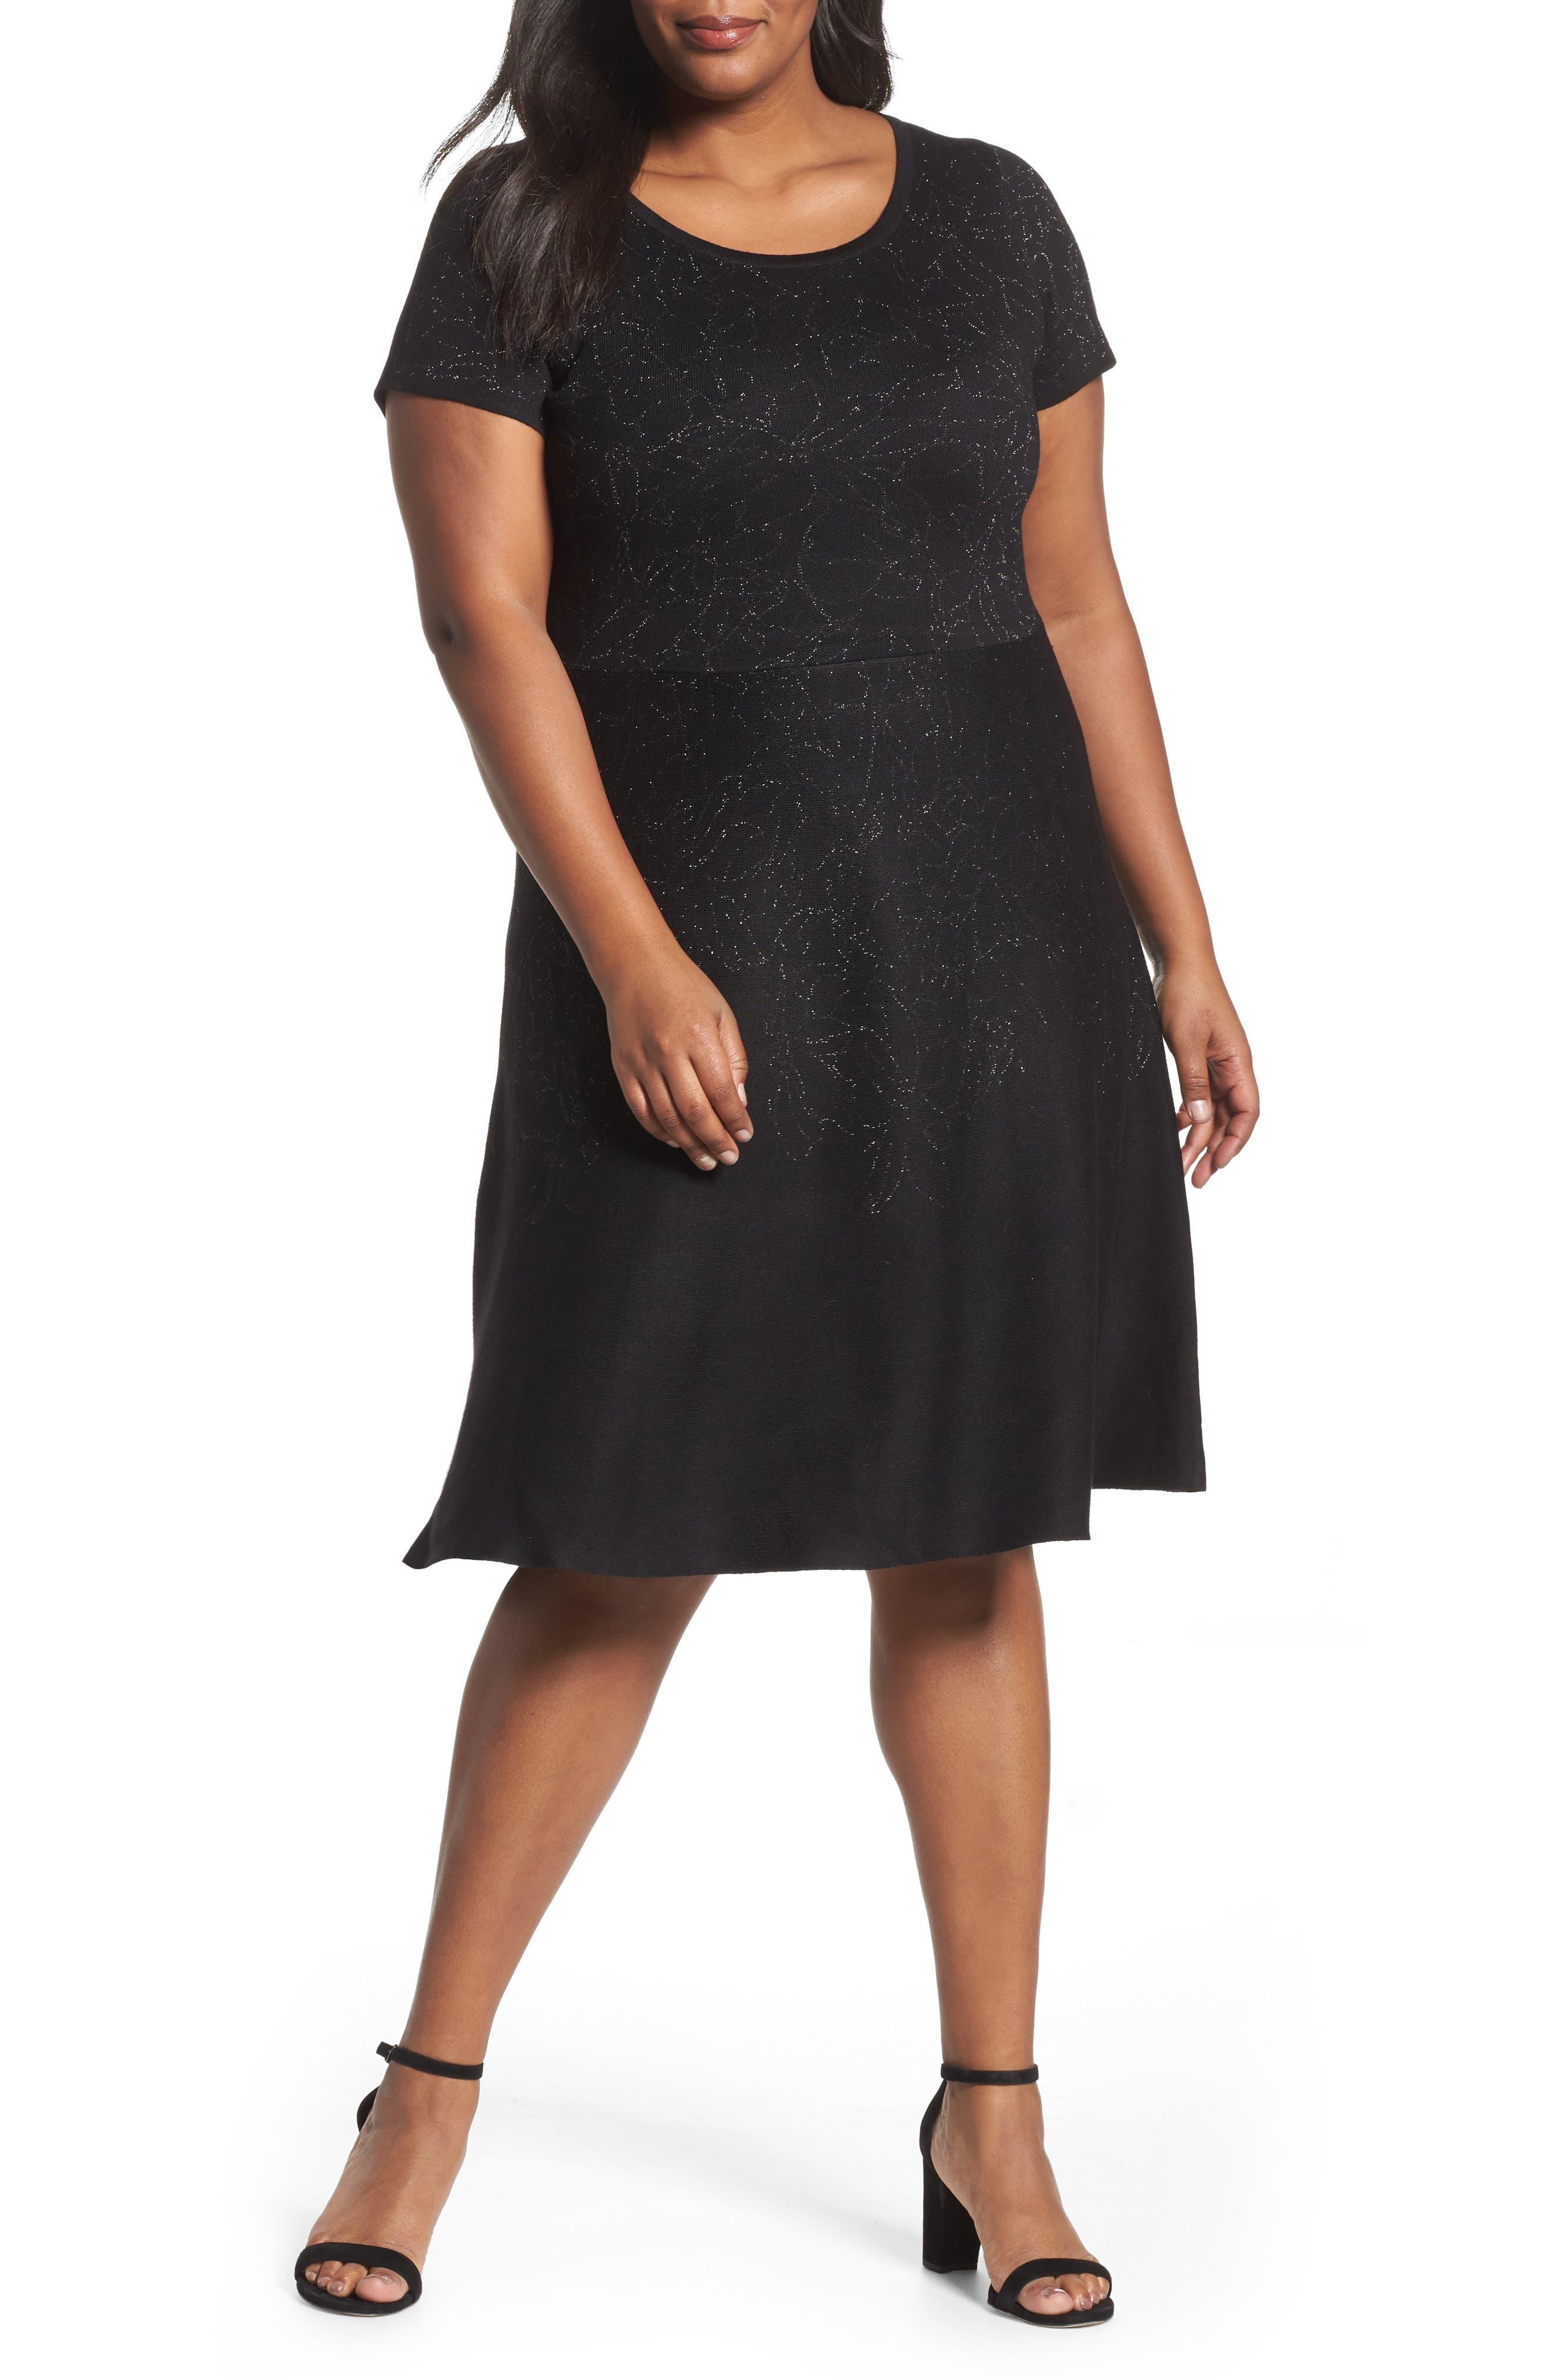 Alternate Image 1 Selected - Taylor Dresses Metallic Knit Fit & Flare Dress (Plus Size)